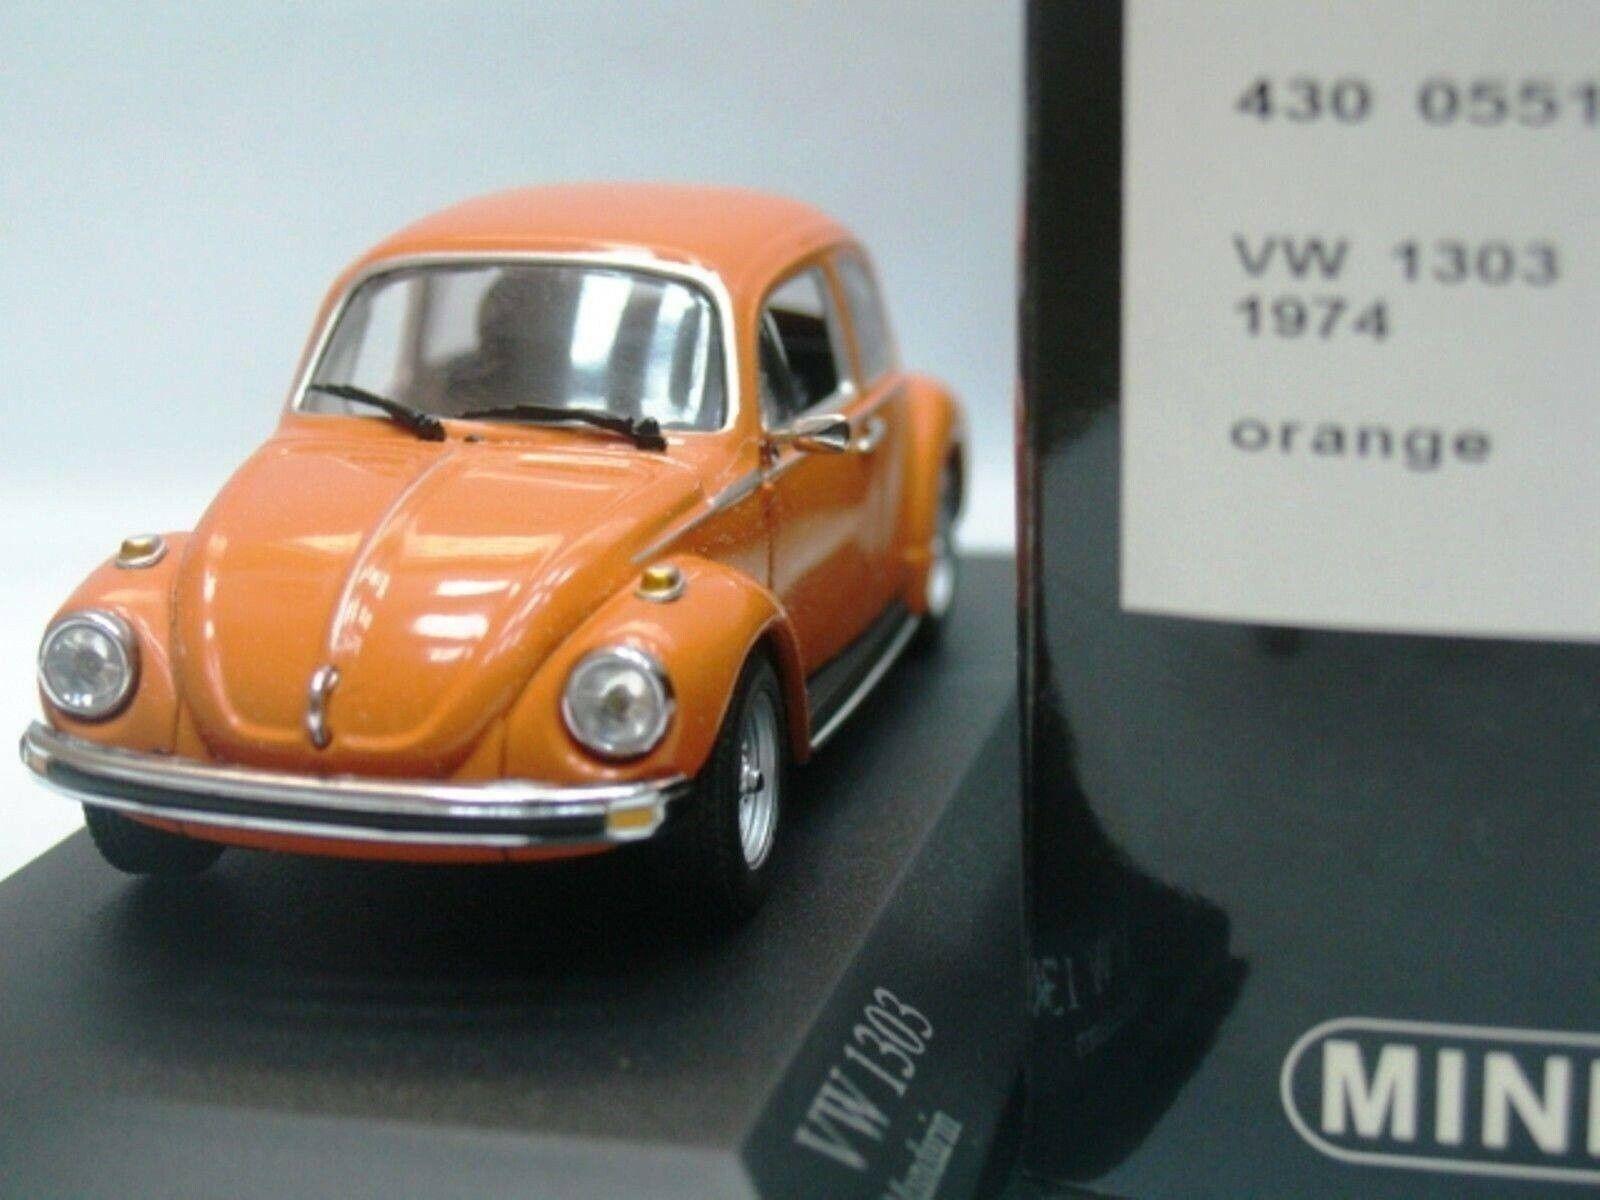 Wow extrêmement rare VW Beetle Käfer 1303 S Saloon 1974 Orange 1 43 Minichamps